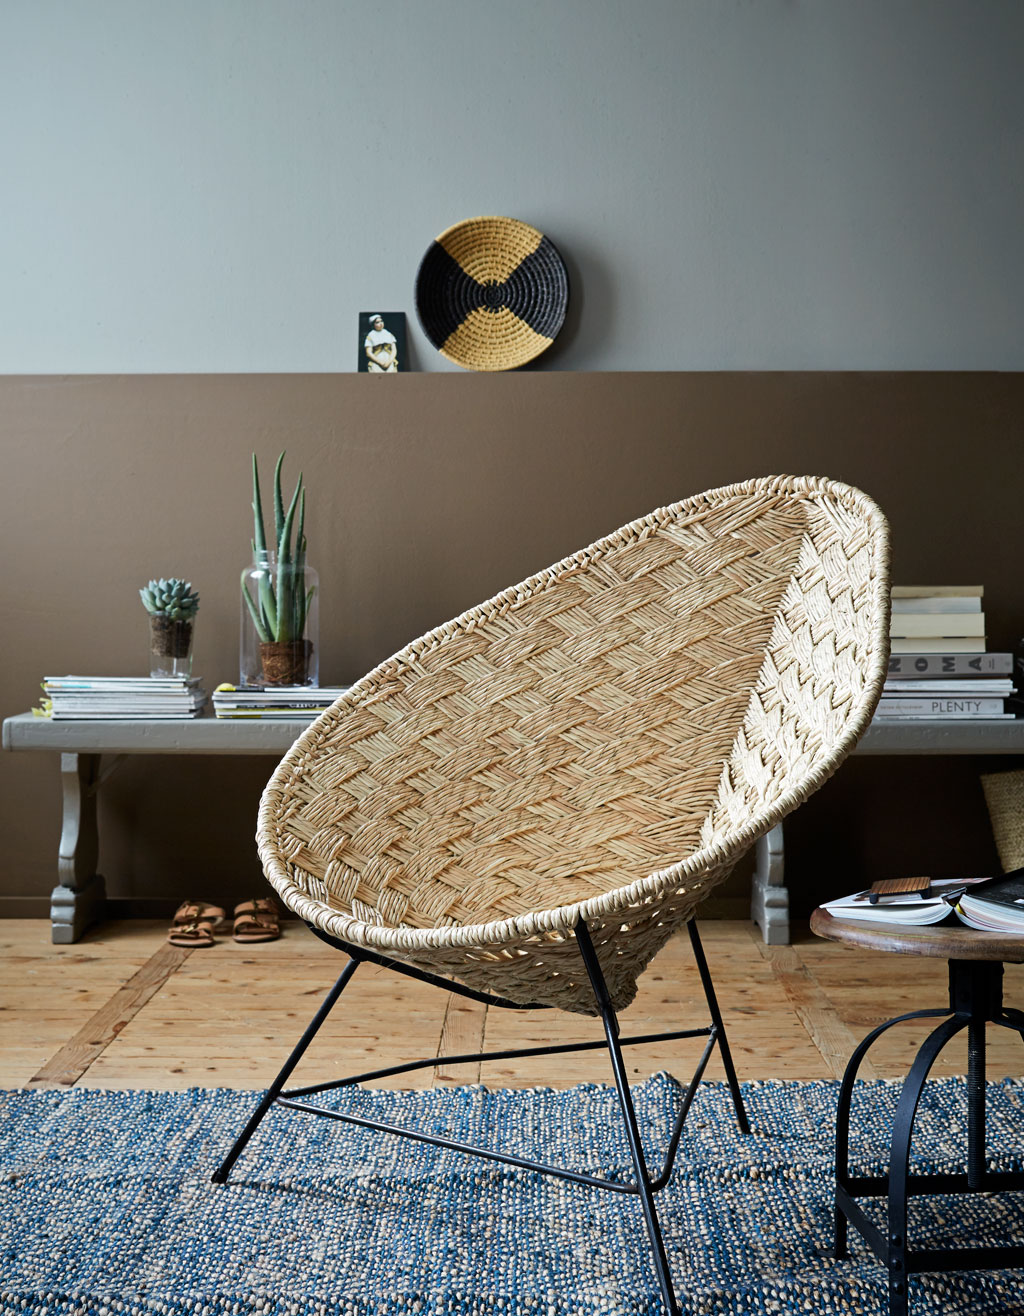 rieten loungestoel